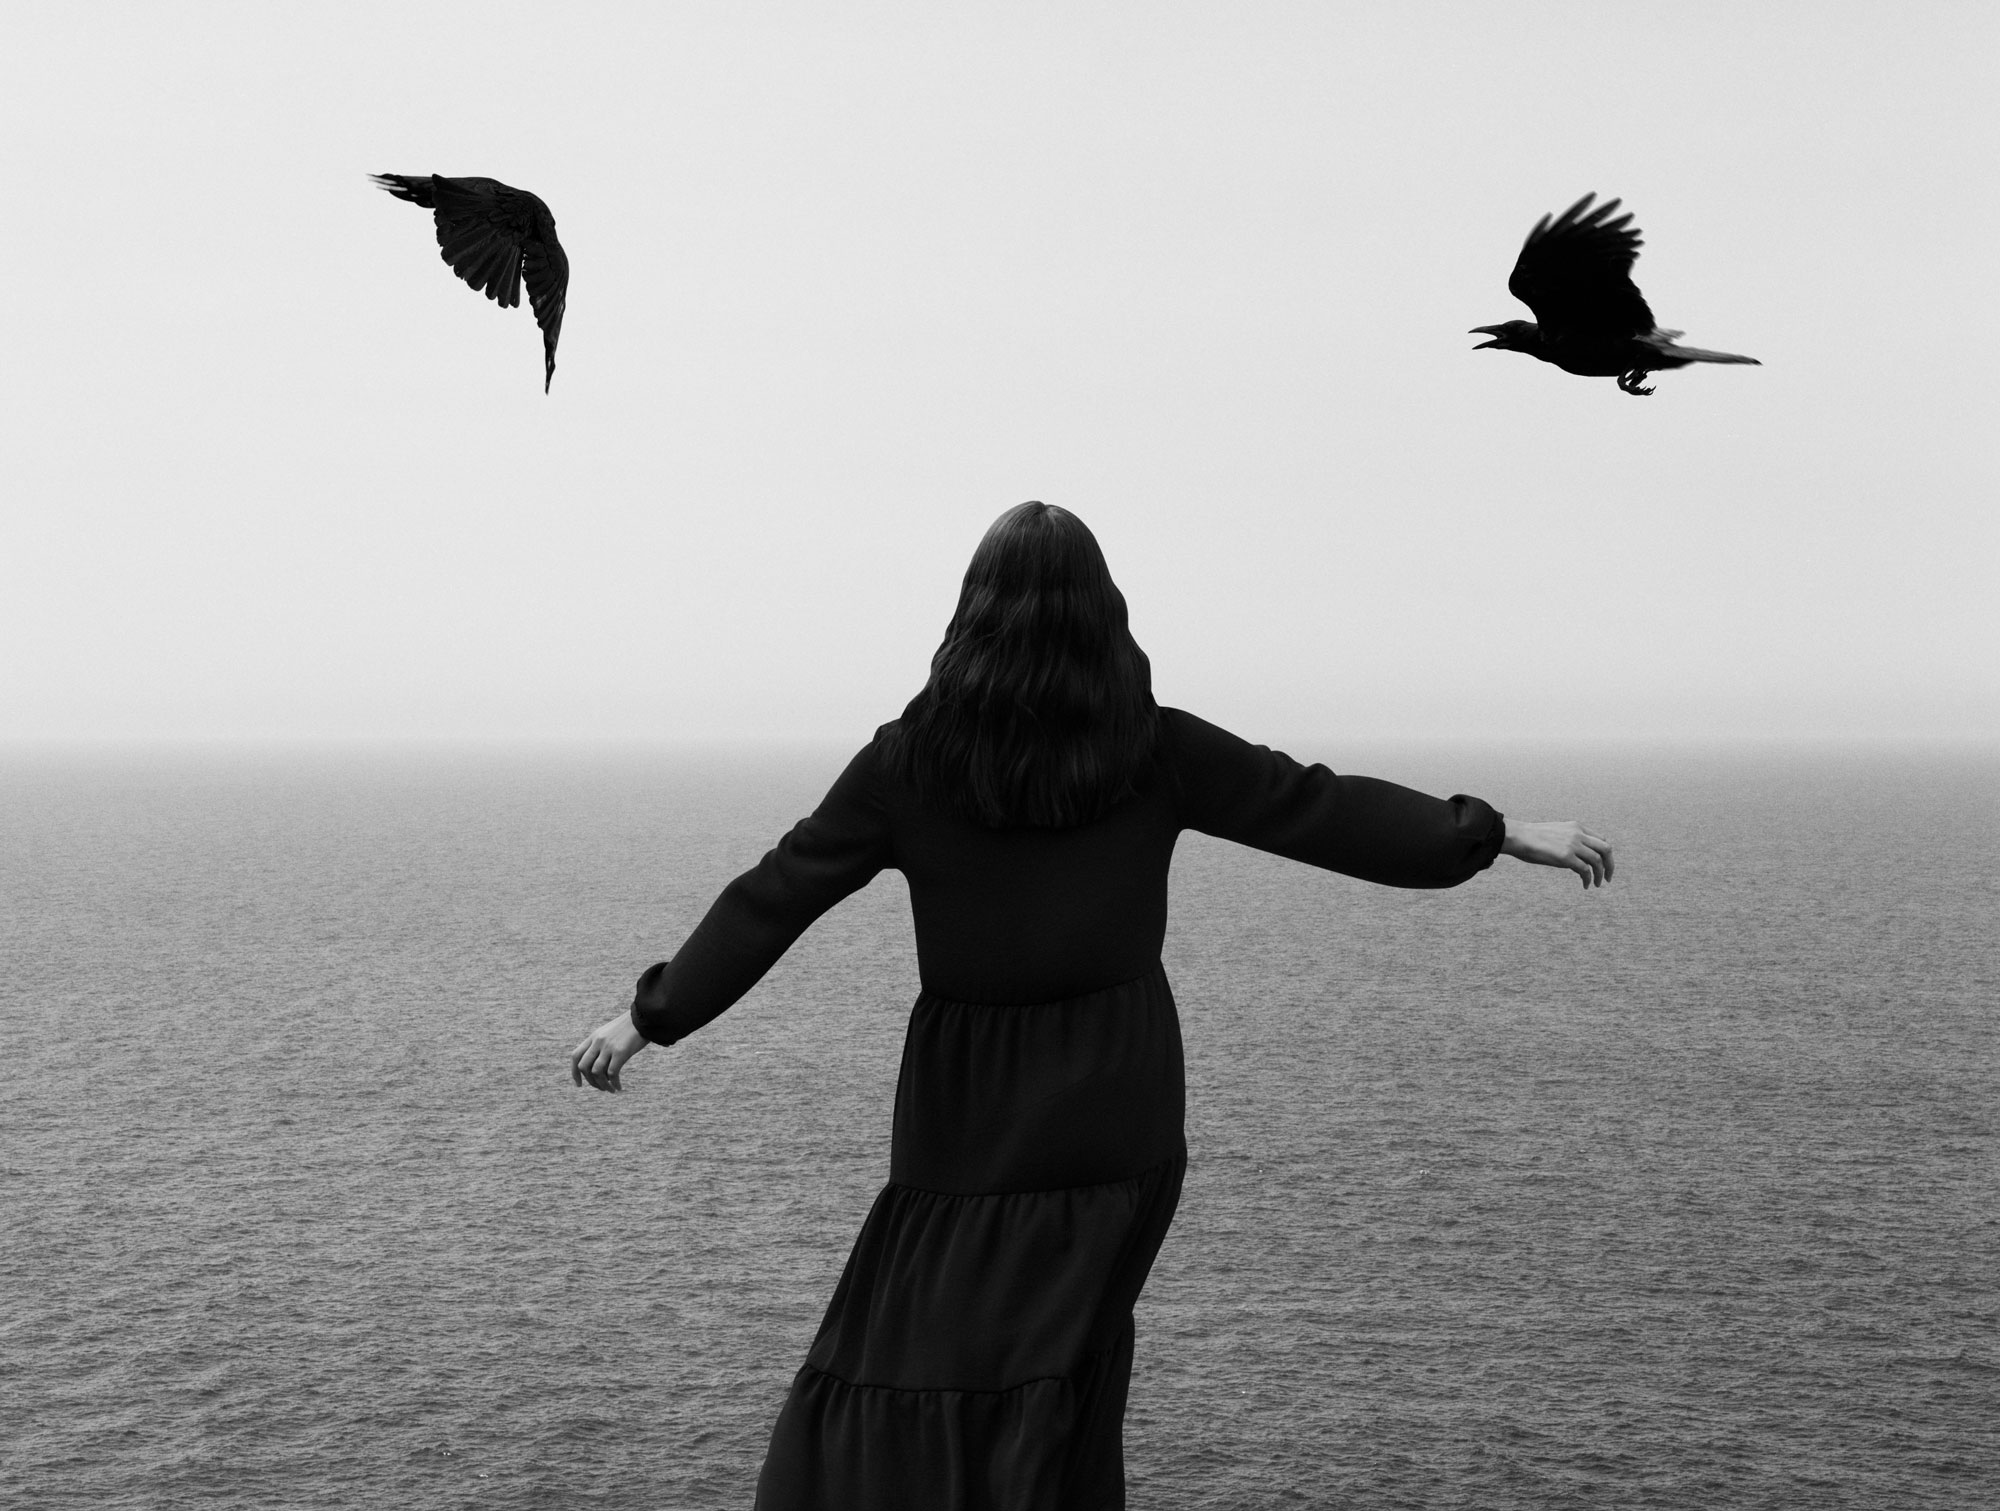 'I screamed aloud (I Will Survive)' 2020, Hayley Millar-Baker. Image: Courtesy of the artist.